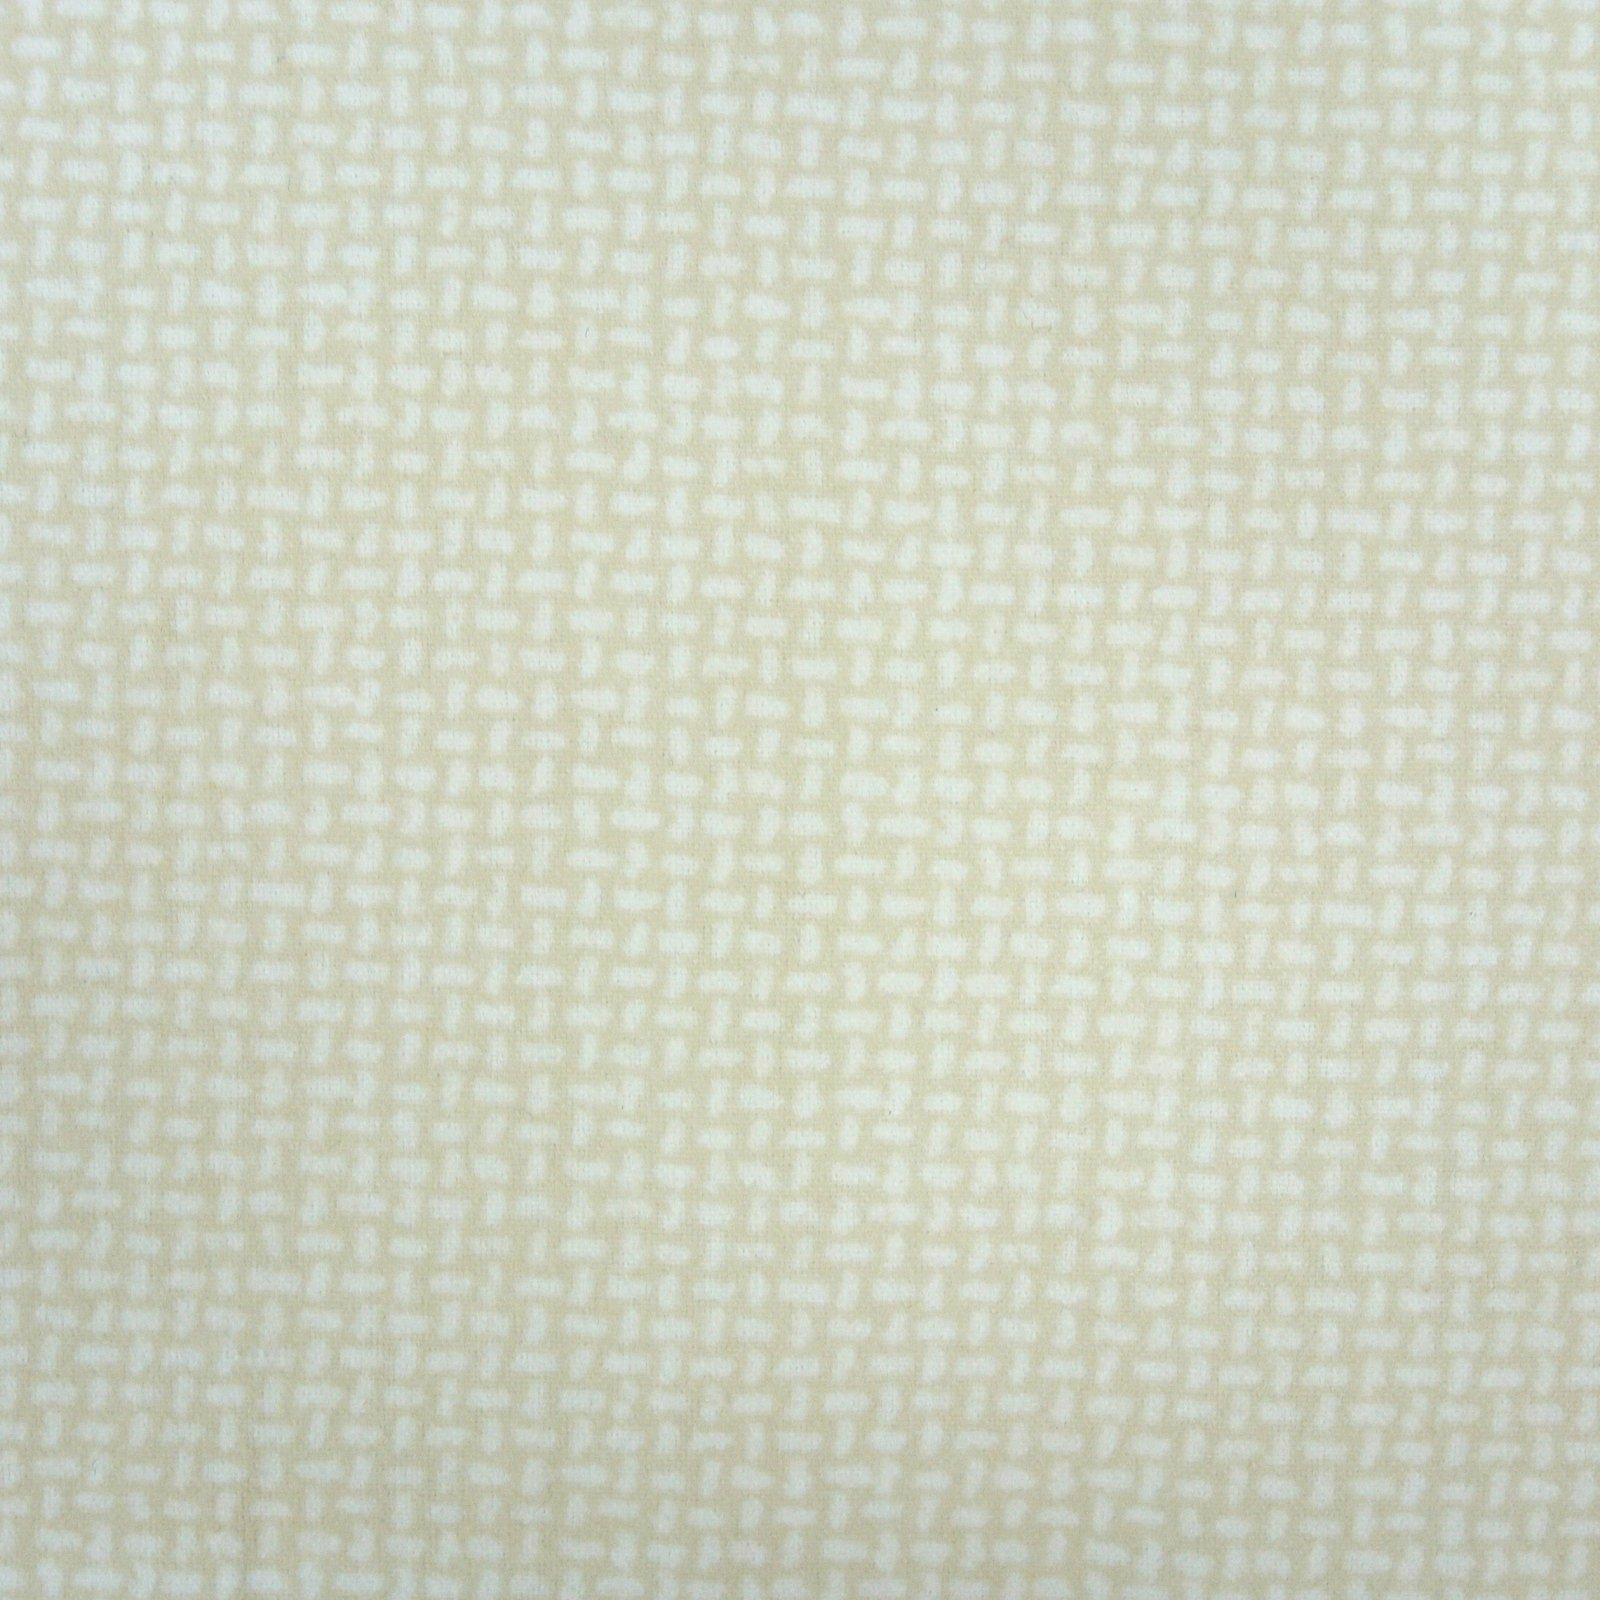 Basket Weave Flannel cream